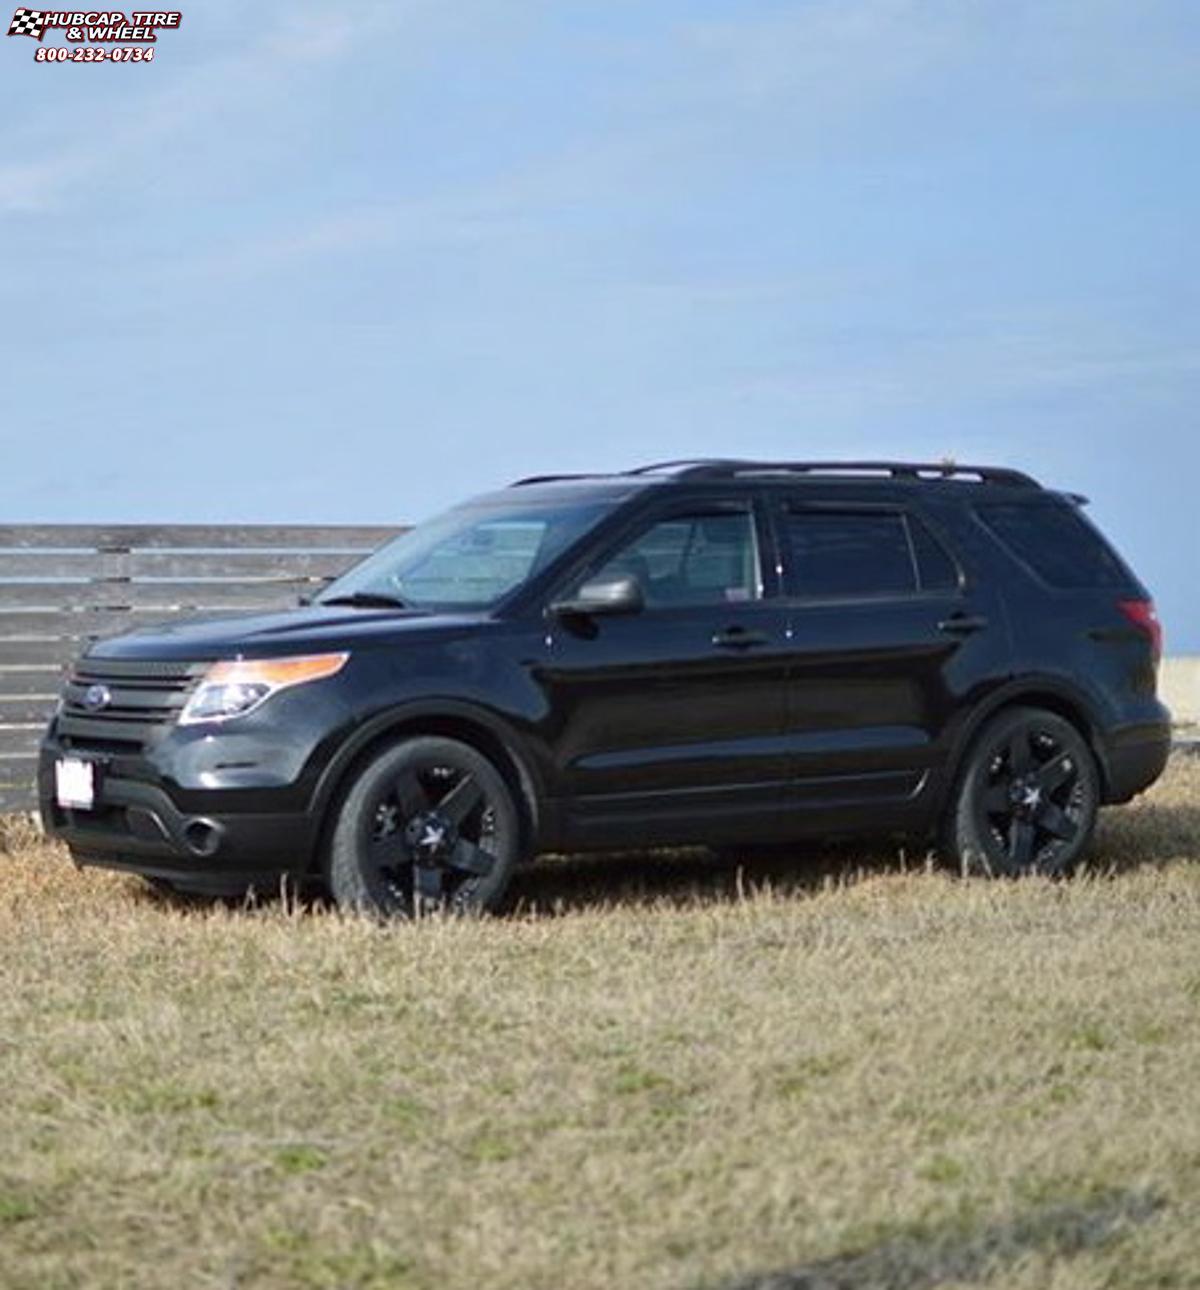 Ford Explorer Xd Series Xd775 Rockstar Wheels Matte Black